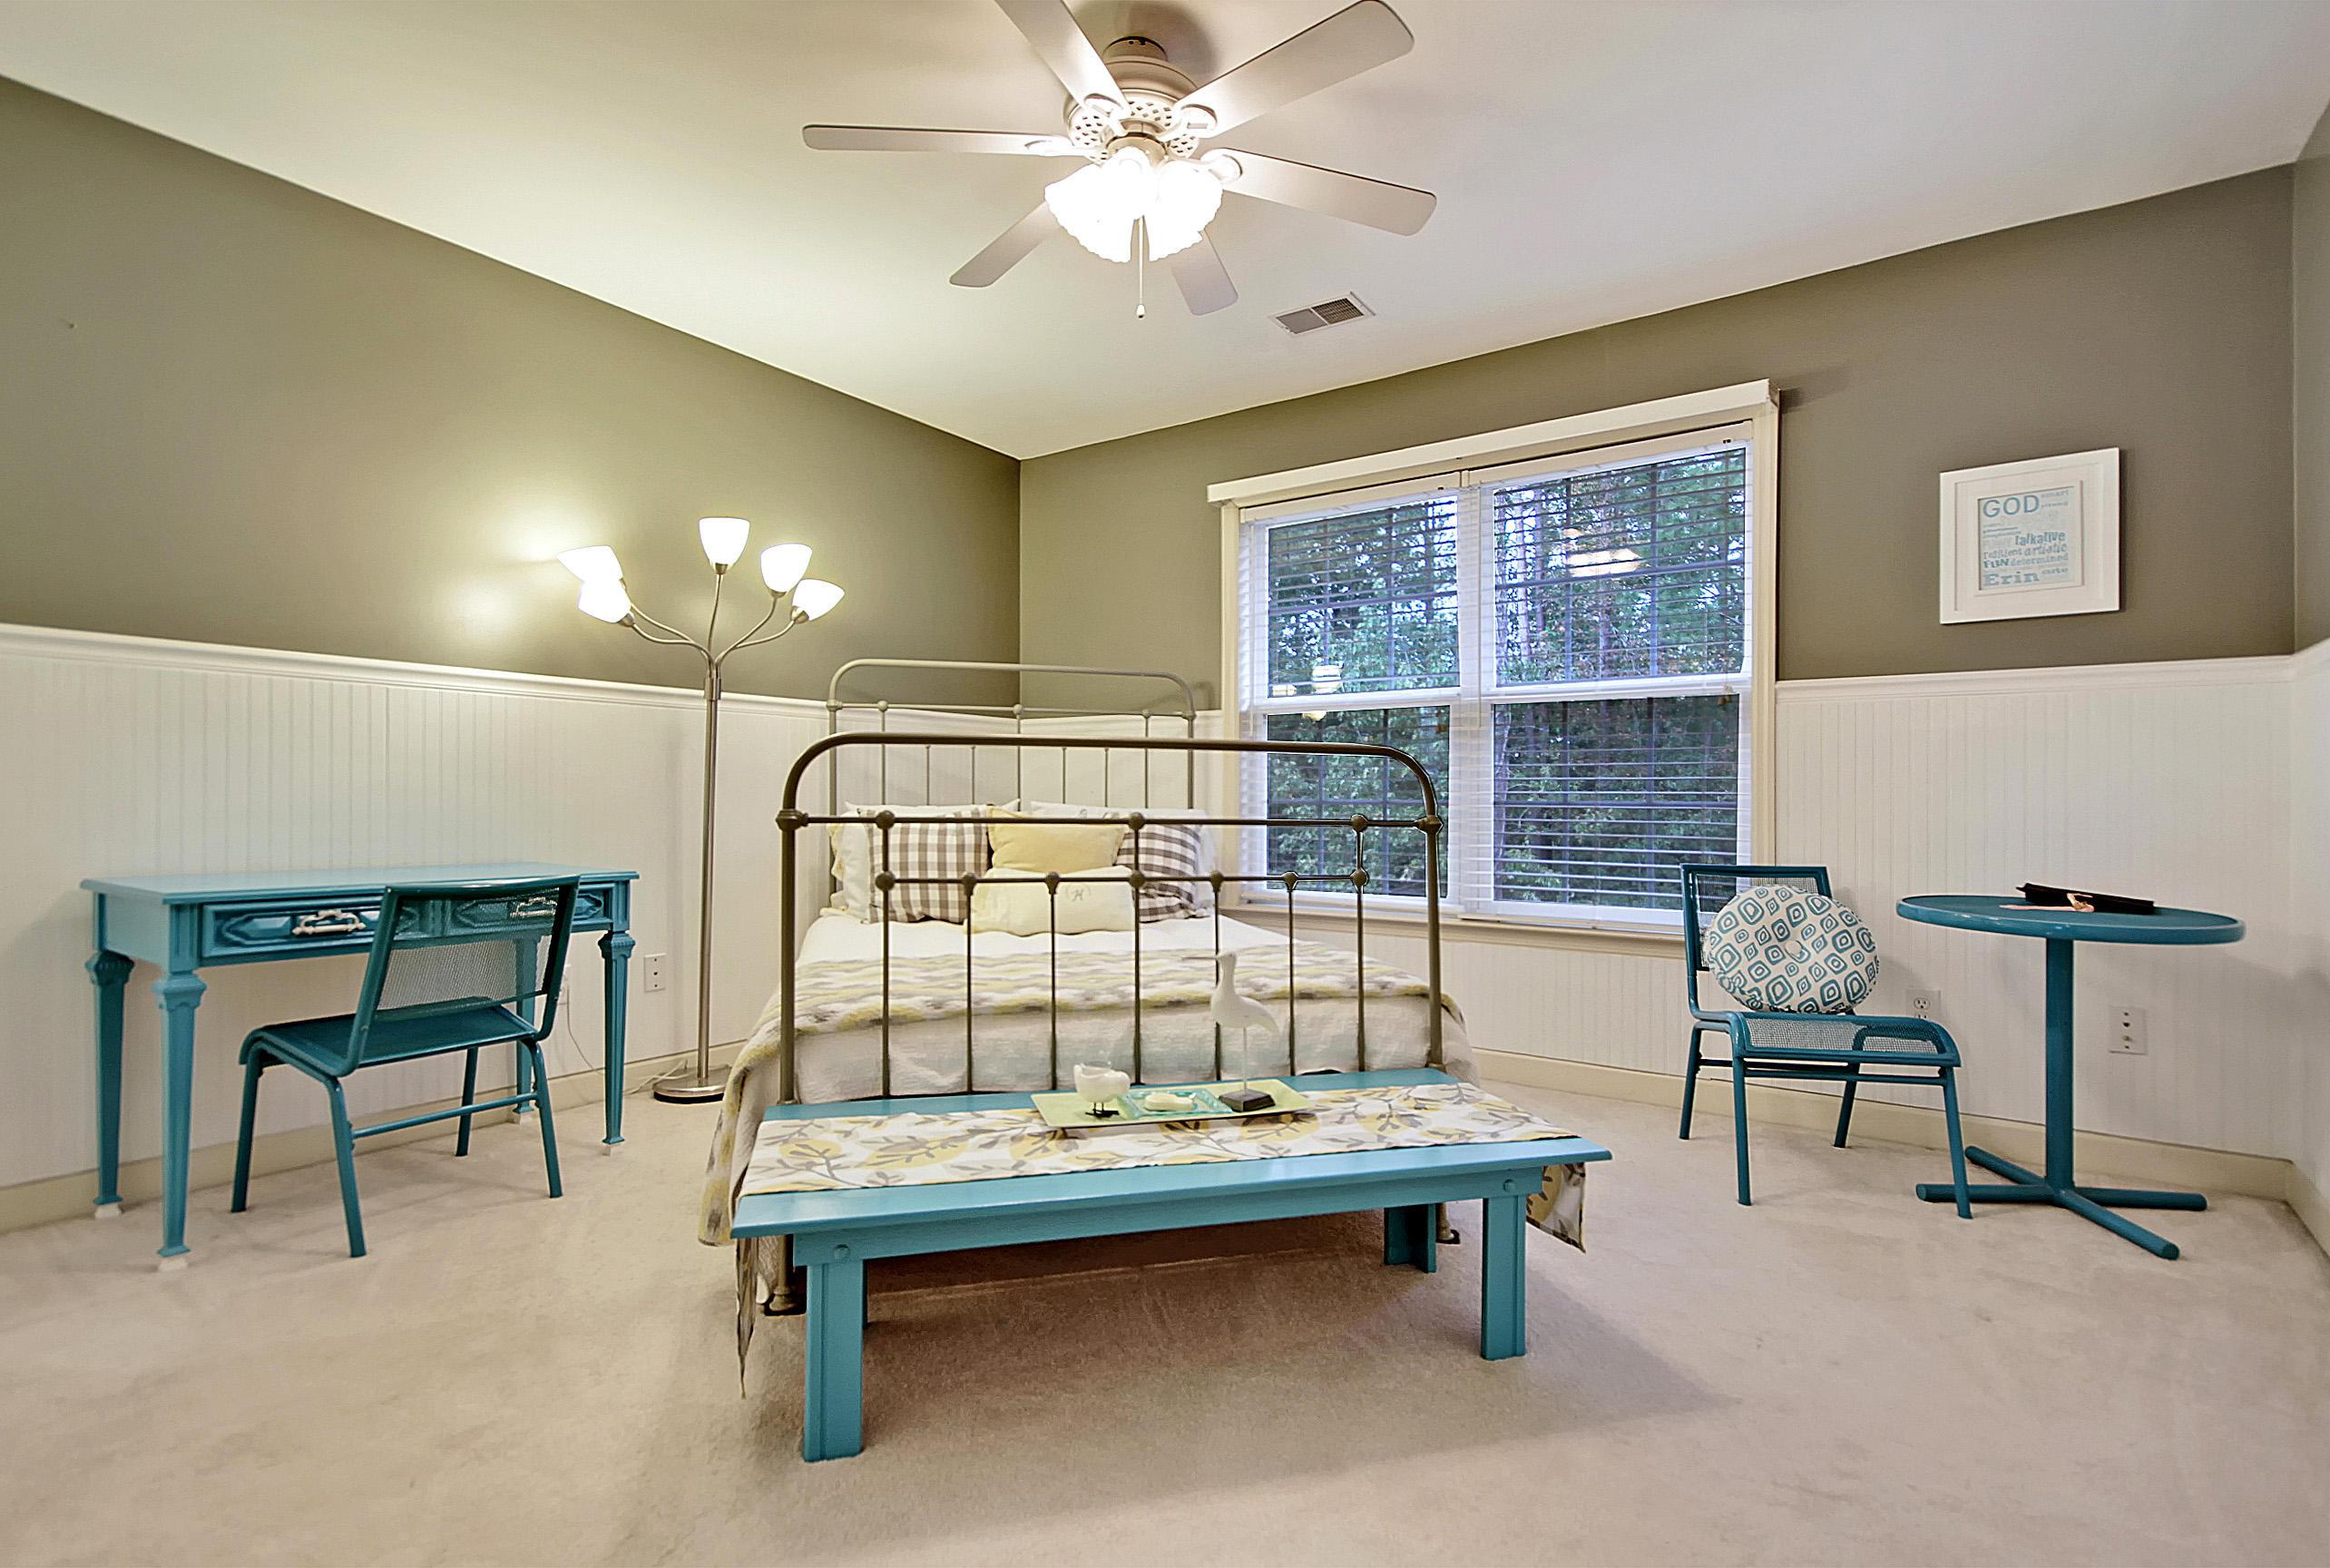 Dunes West Homes For Sale - 2449 Darts Cove, Mount Pleasant, SC - 11